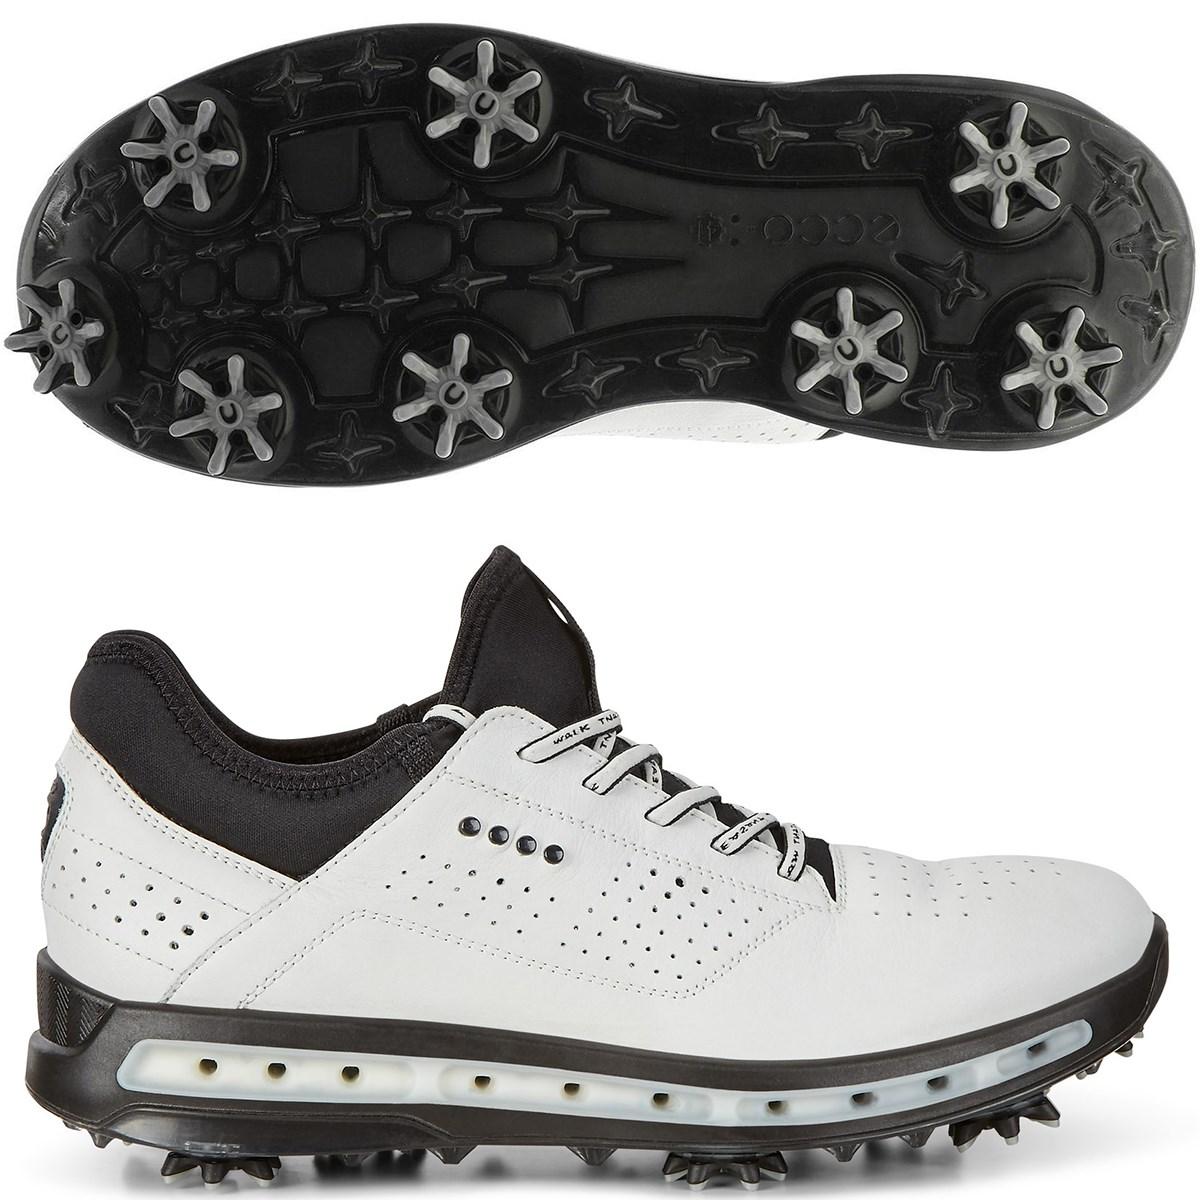 ecco エコー ゴルフ クール GTX シューズ 26.5cm/EUサイズ42 ホワイト